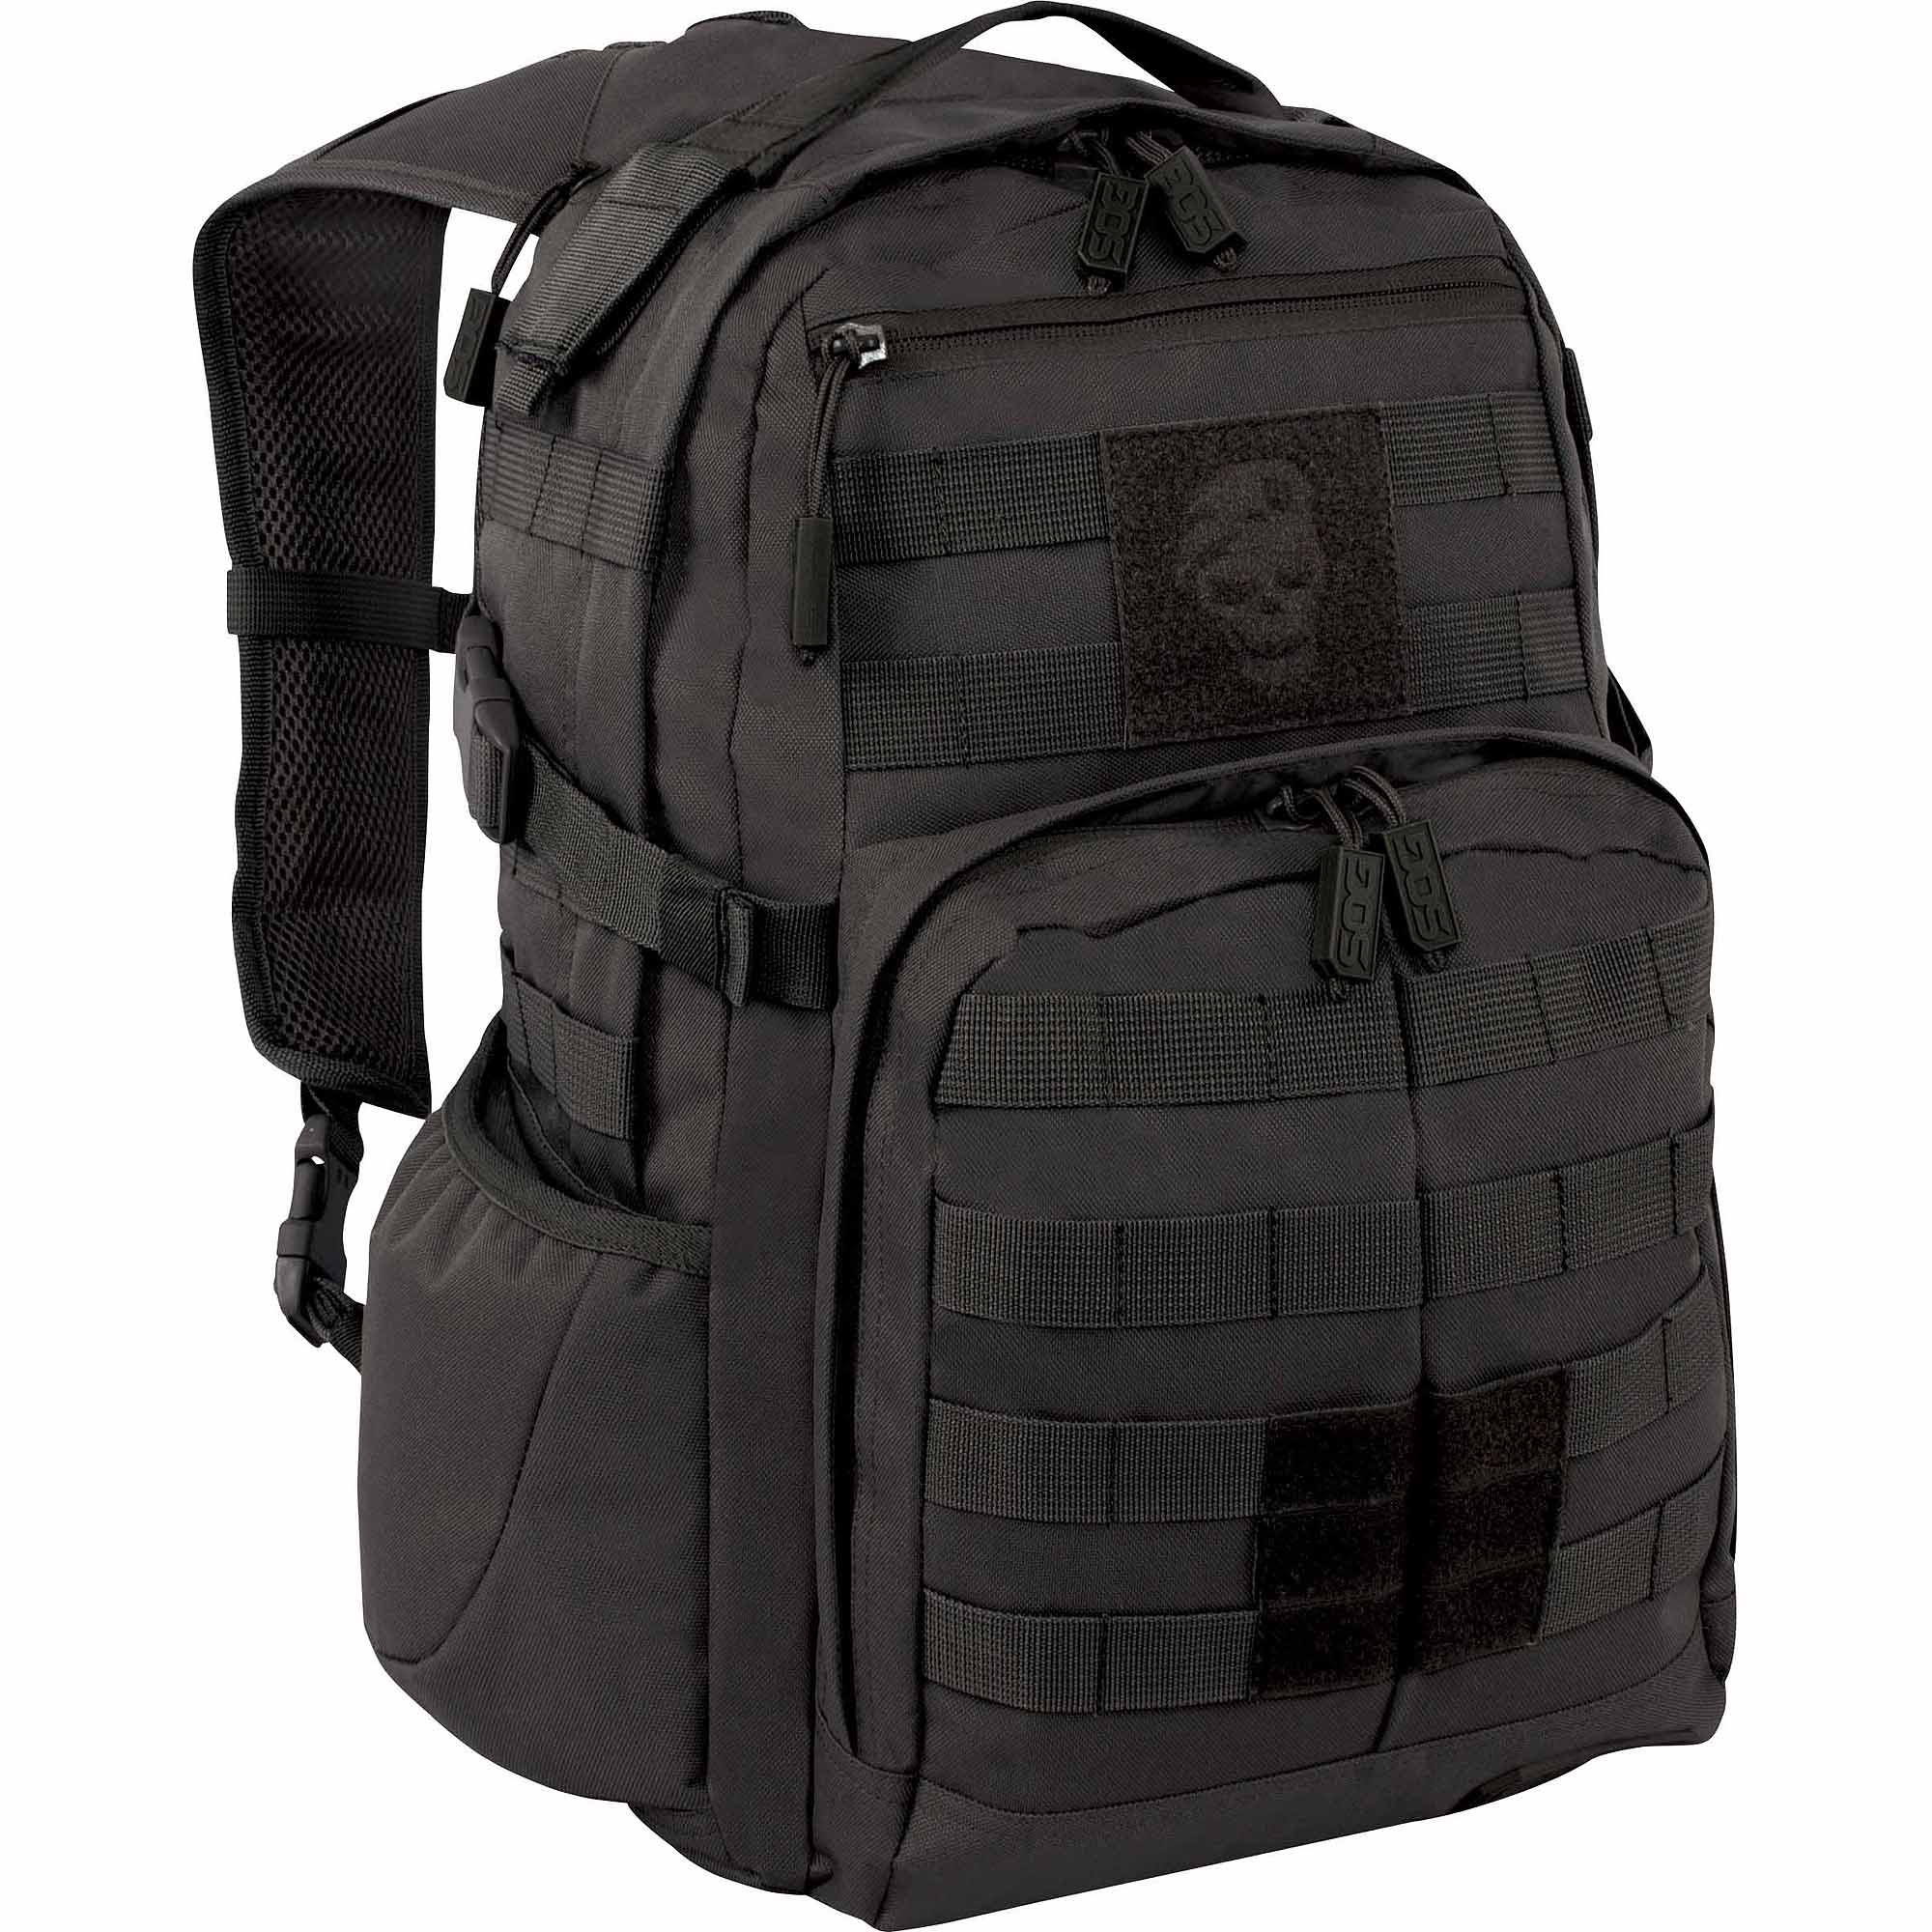 SOG Ninja Tactical Day Pack